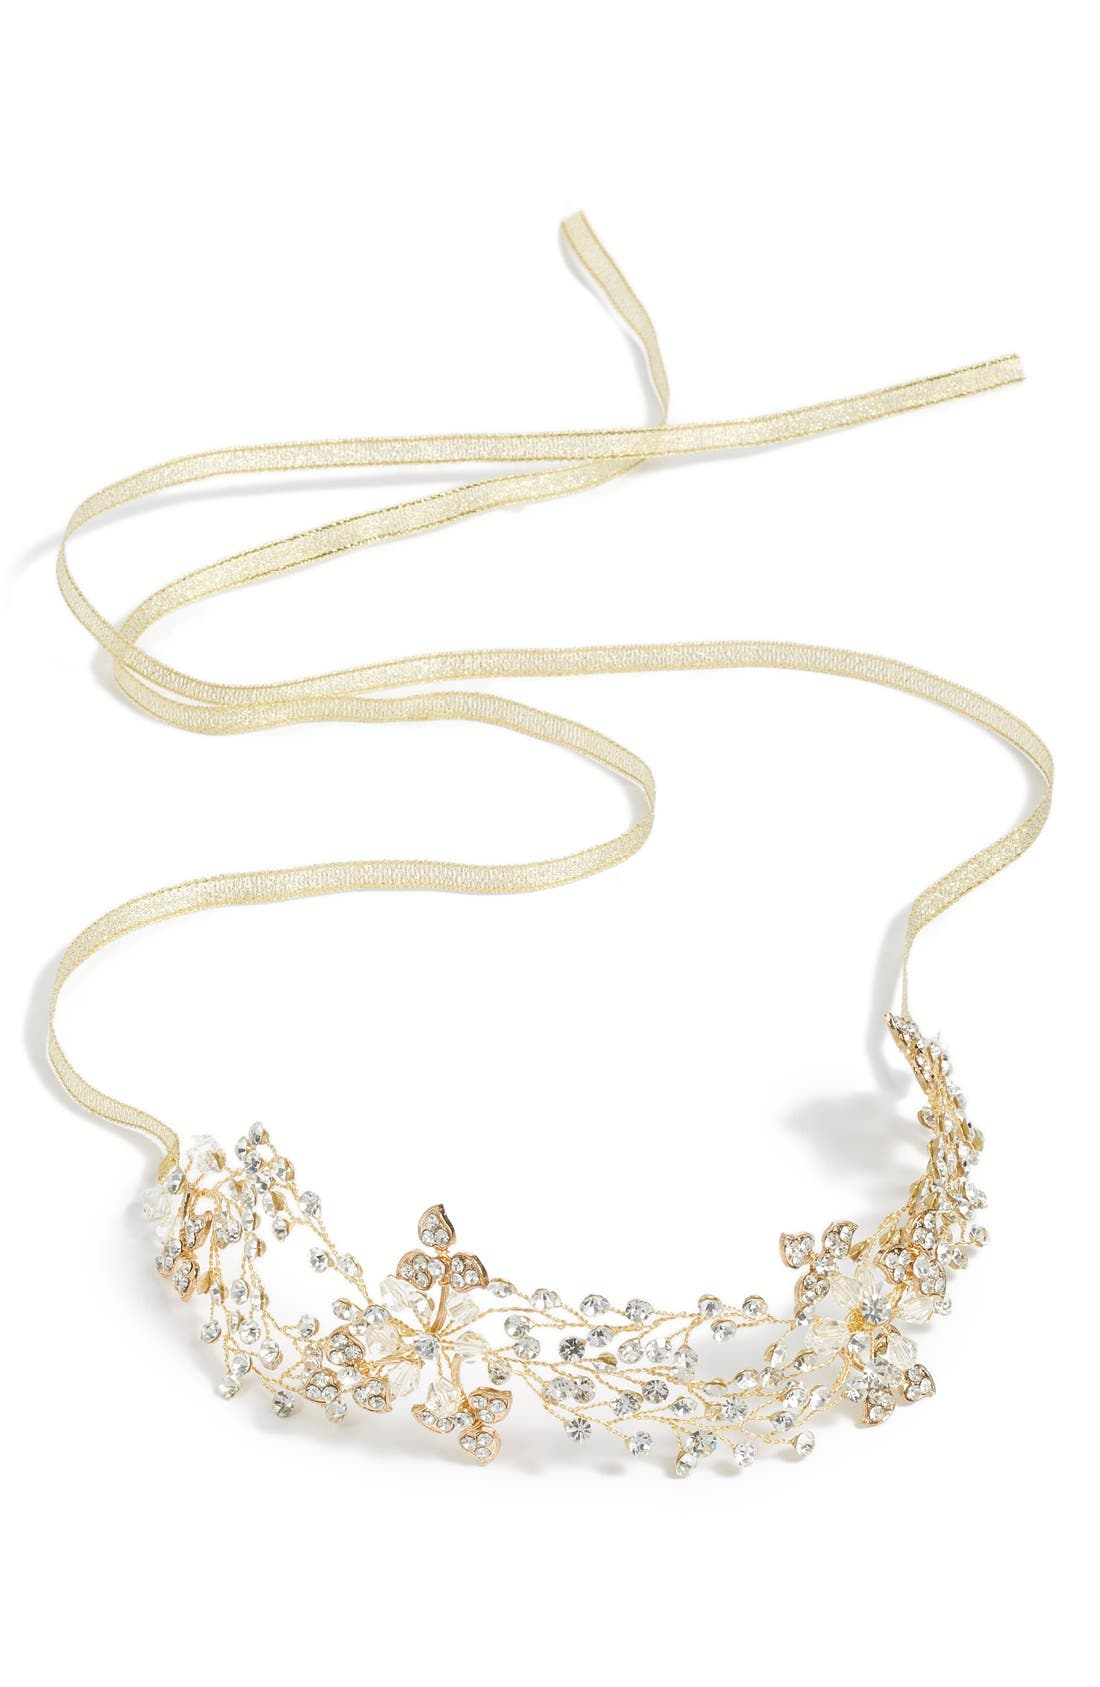 Main Image - Nina Crystal Embellished Floral Head Wrap